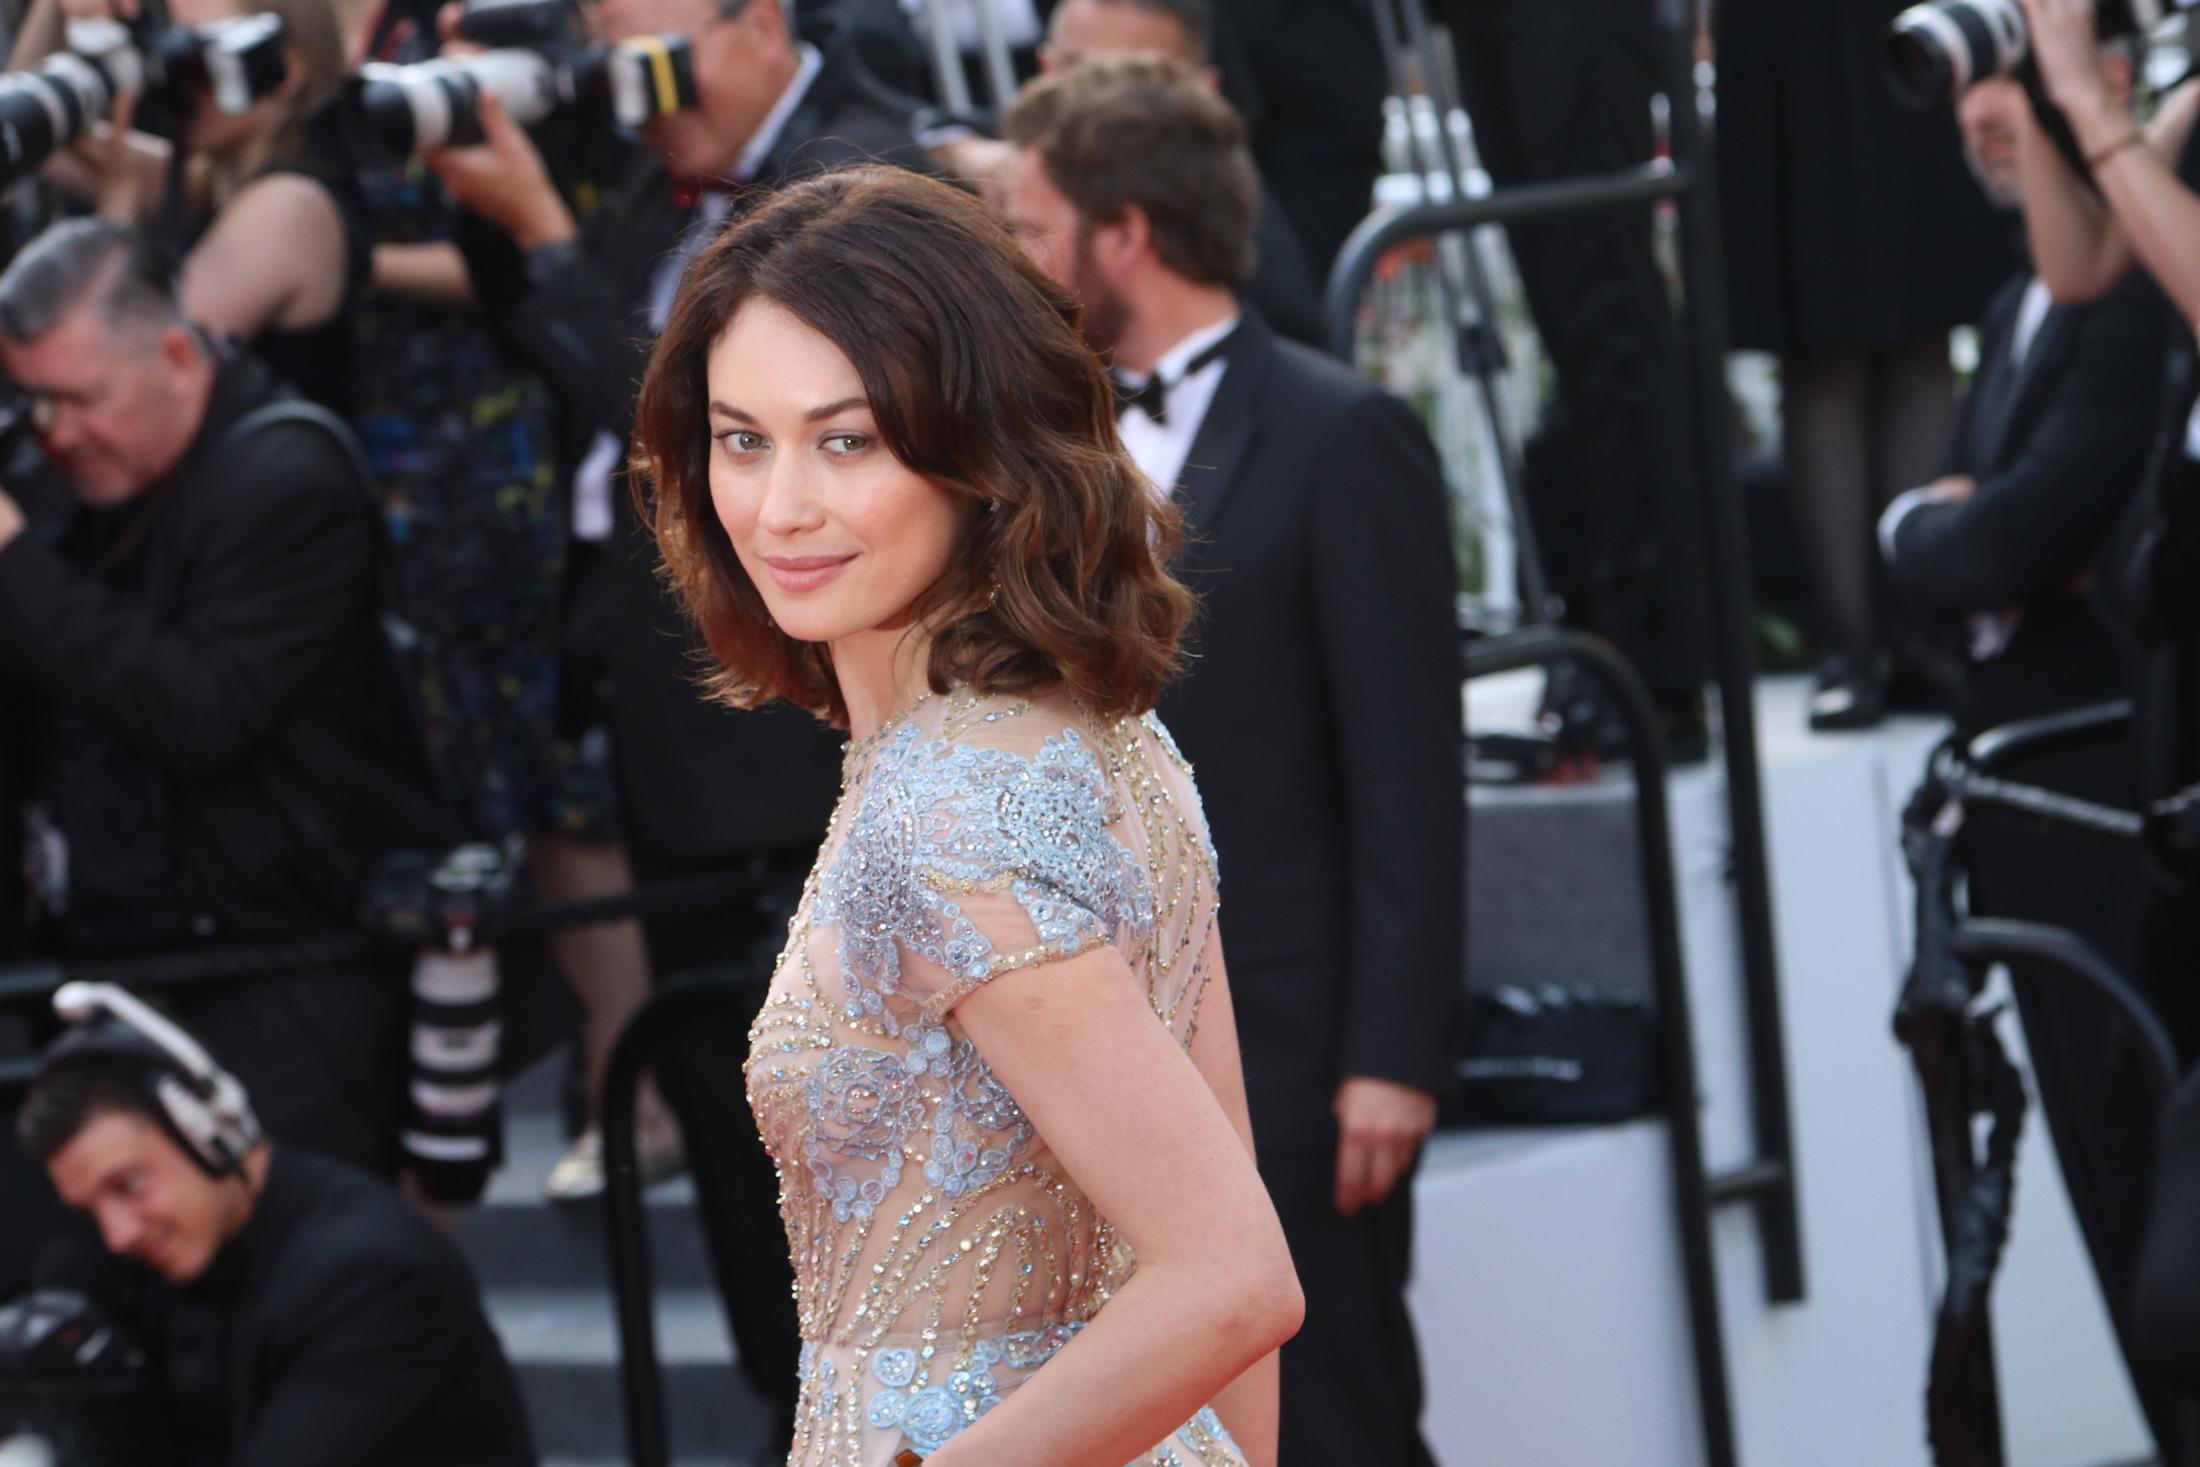 Cannes 2017: uno catto di Olga Kurylenko sul red carpet di The Meyerowitz Stories